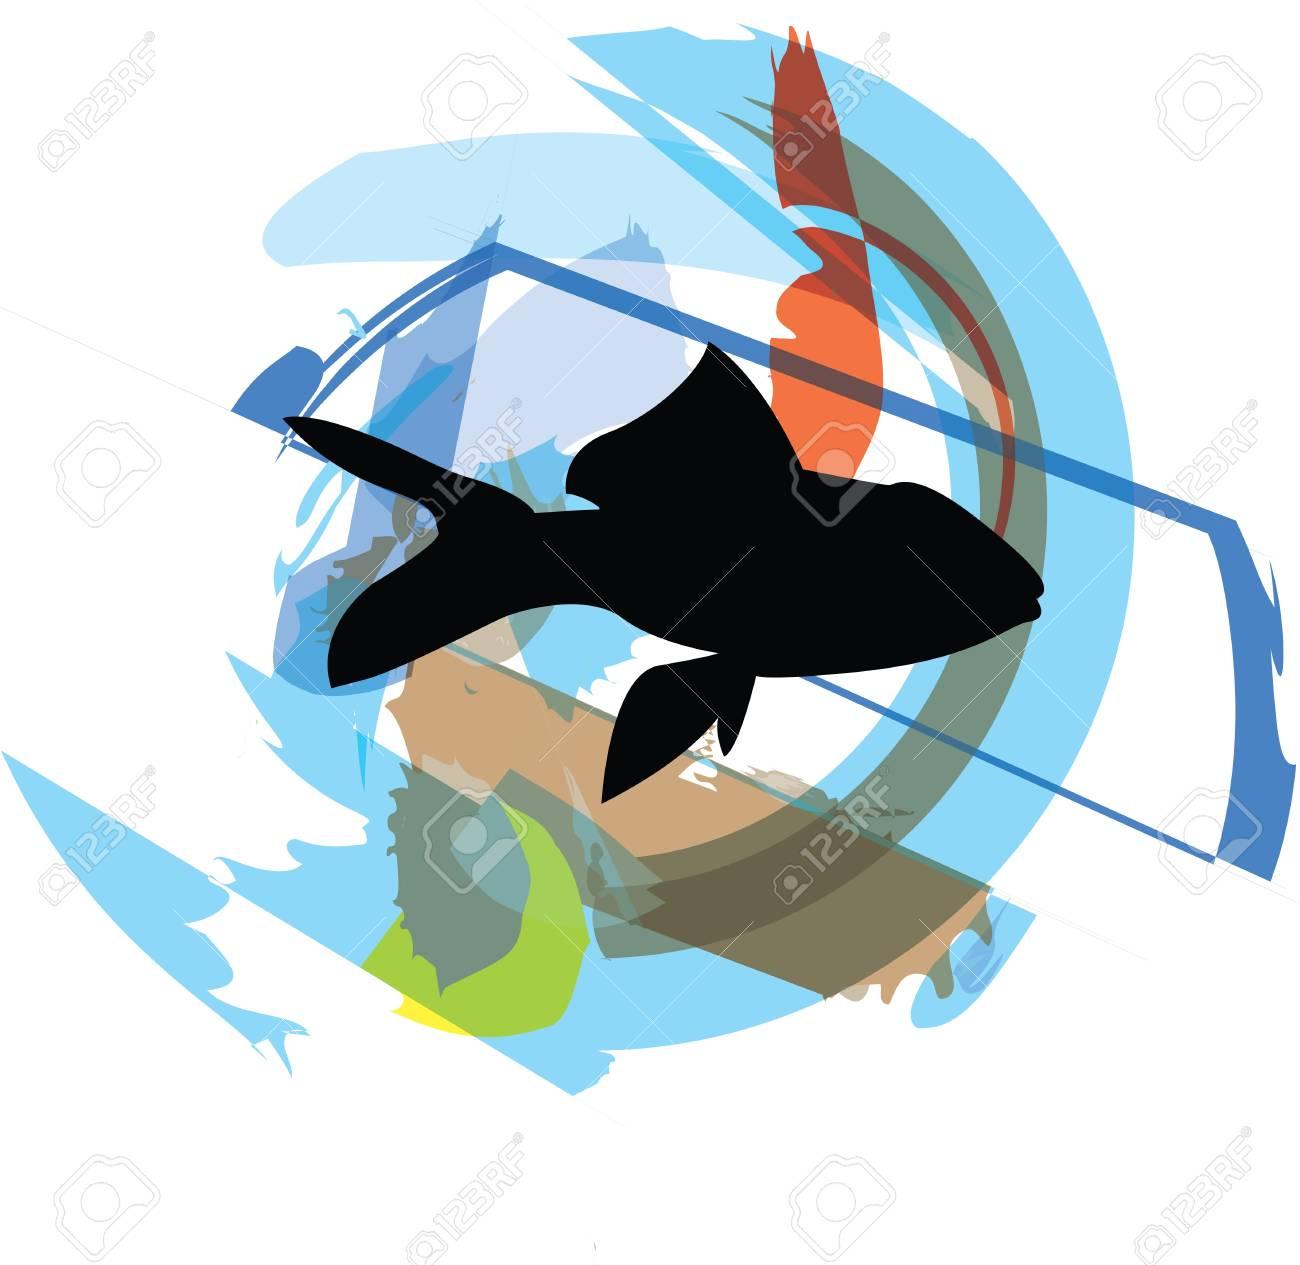 Fish illustration Stock Vector - 10892518